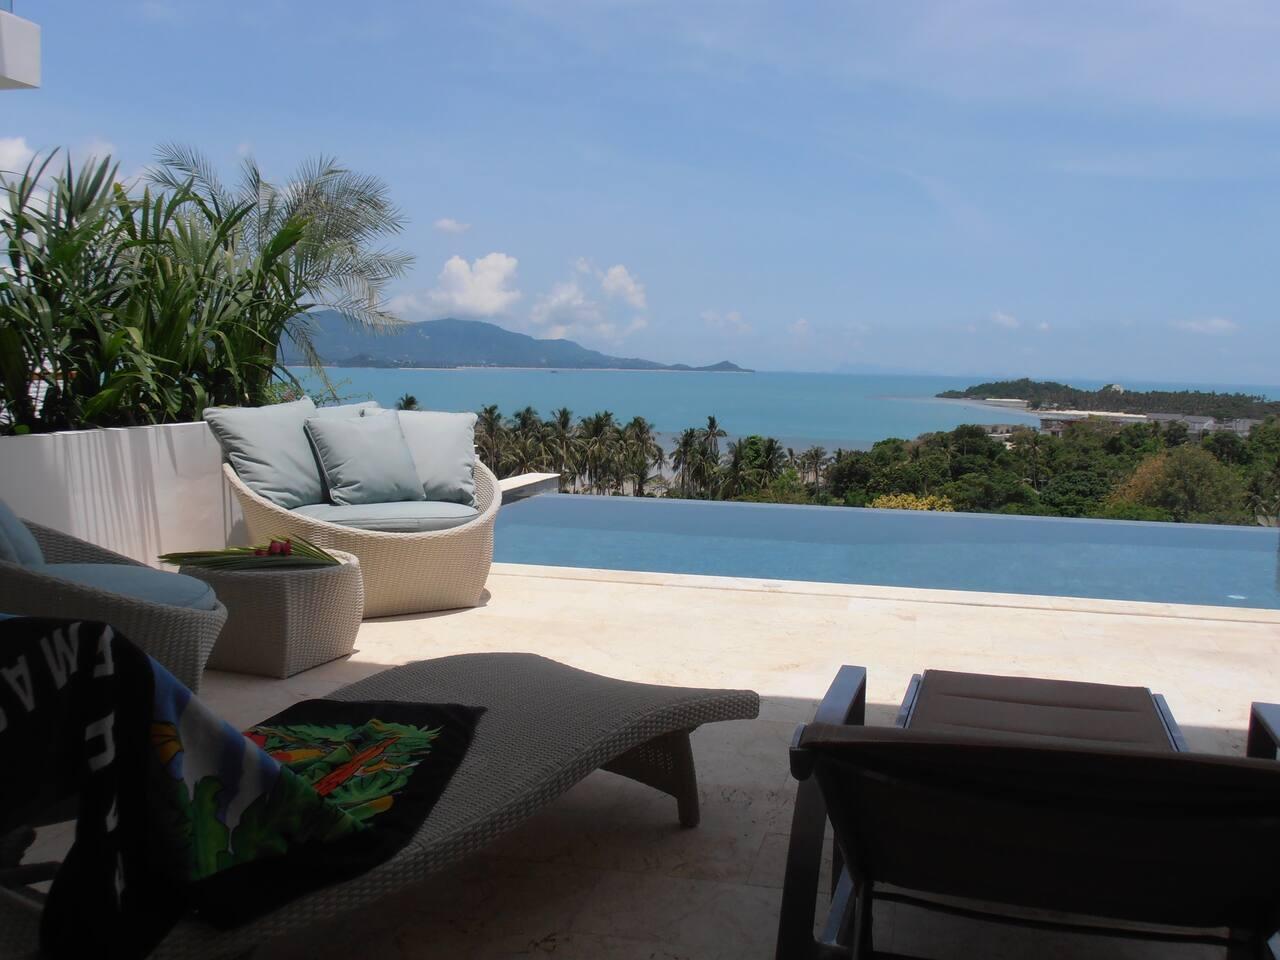 Samui Sunset Deluxe Villa With Beach Access